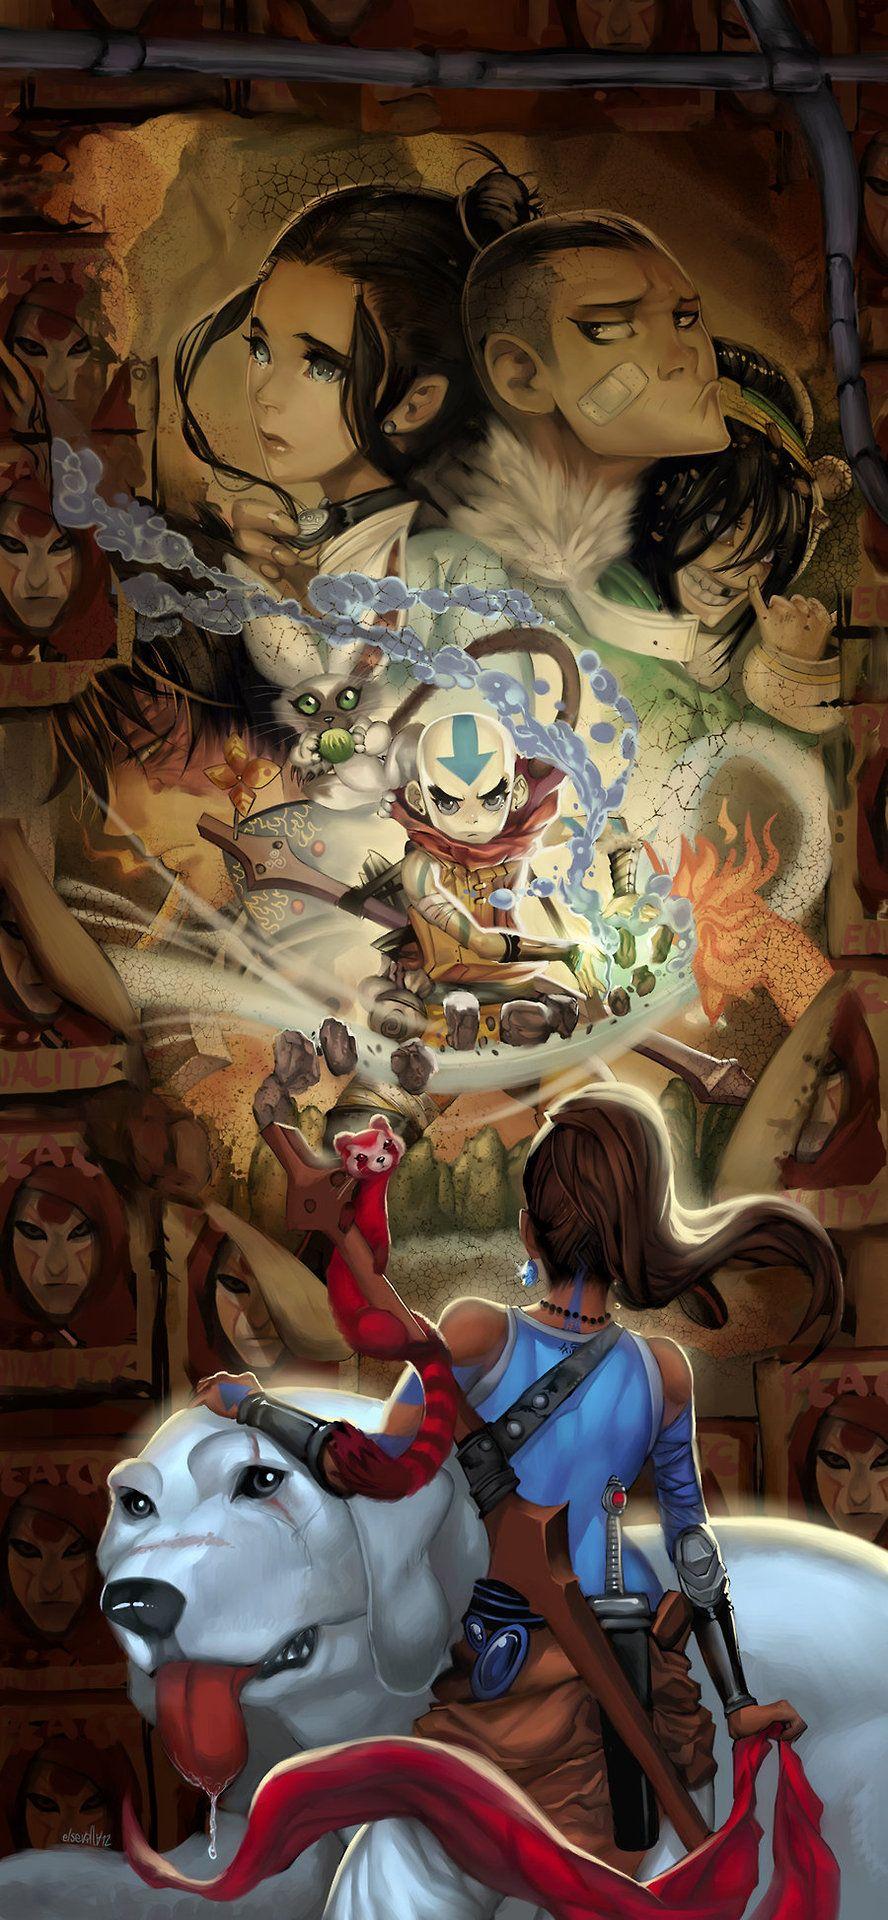 elsevilla Avatar aang, Anime, Korra